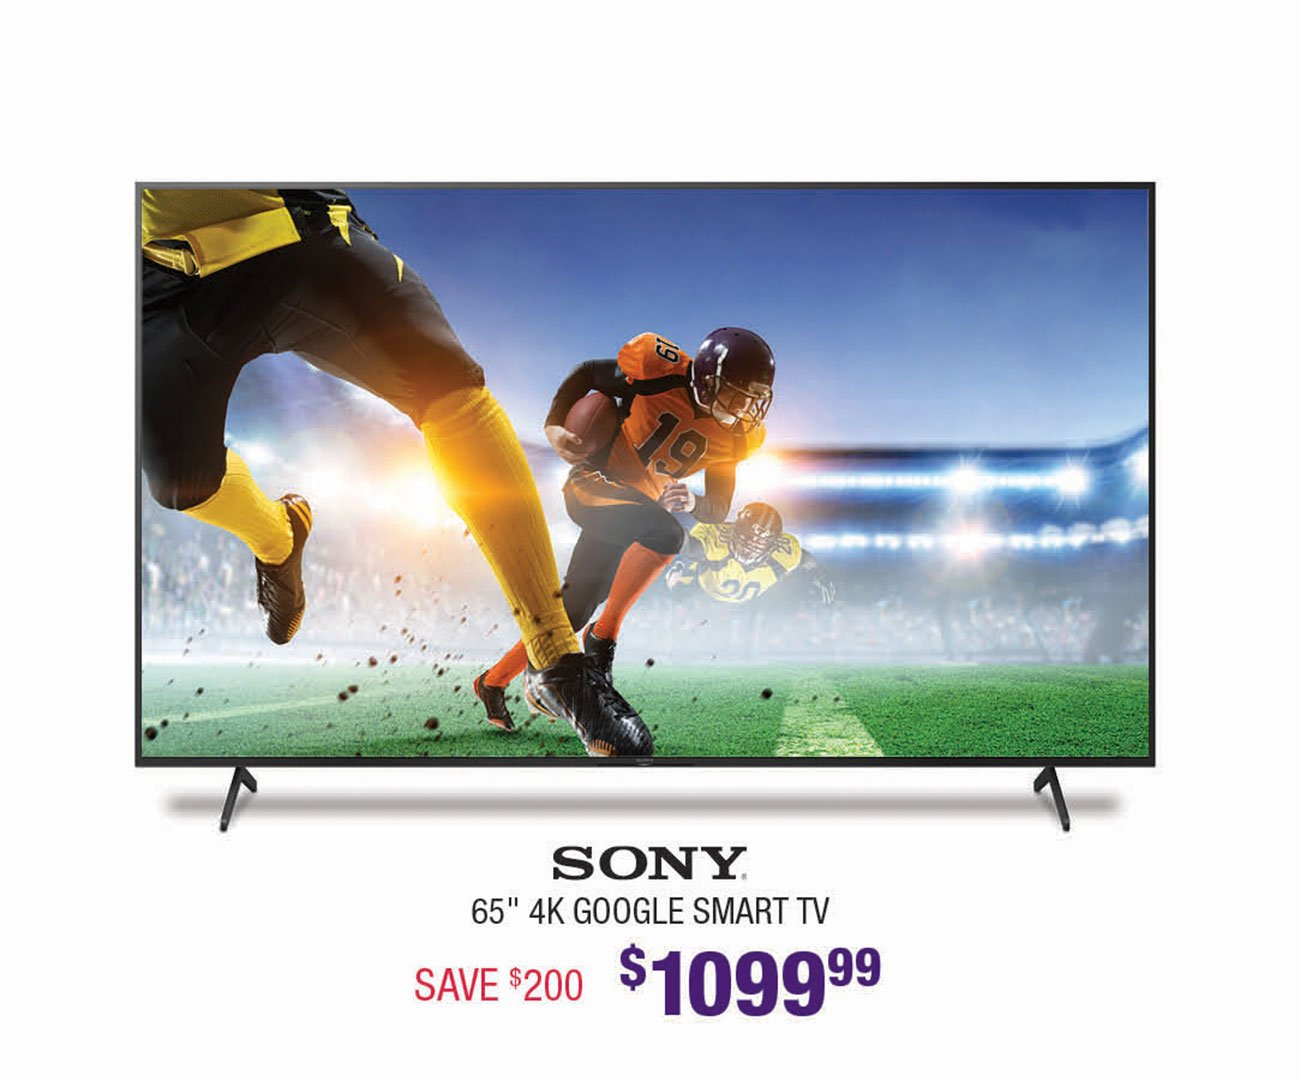 Sony-4K-Google-Smart-TV-UIRV